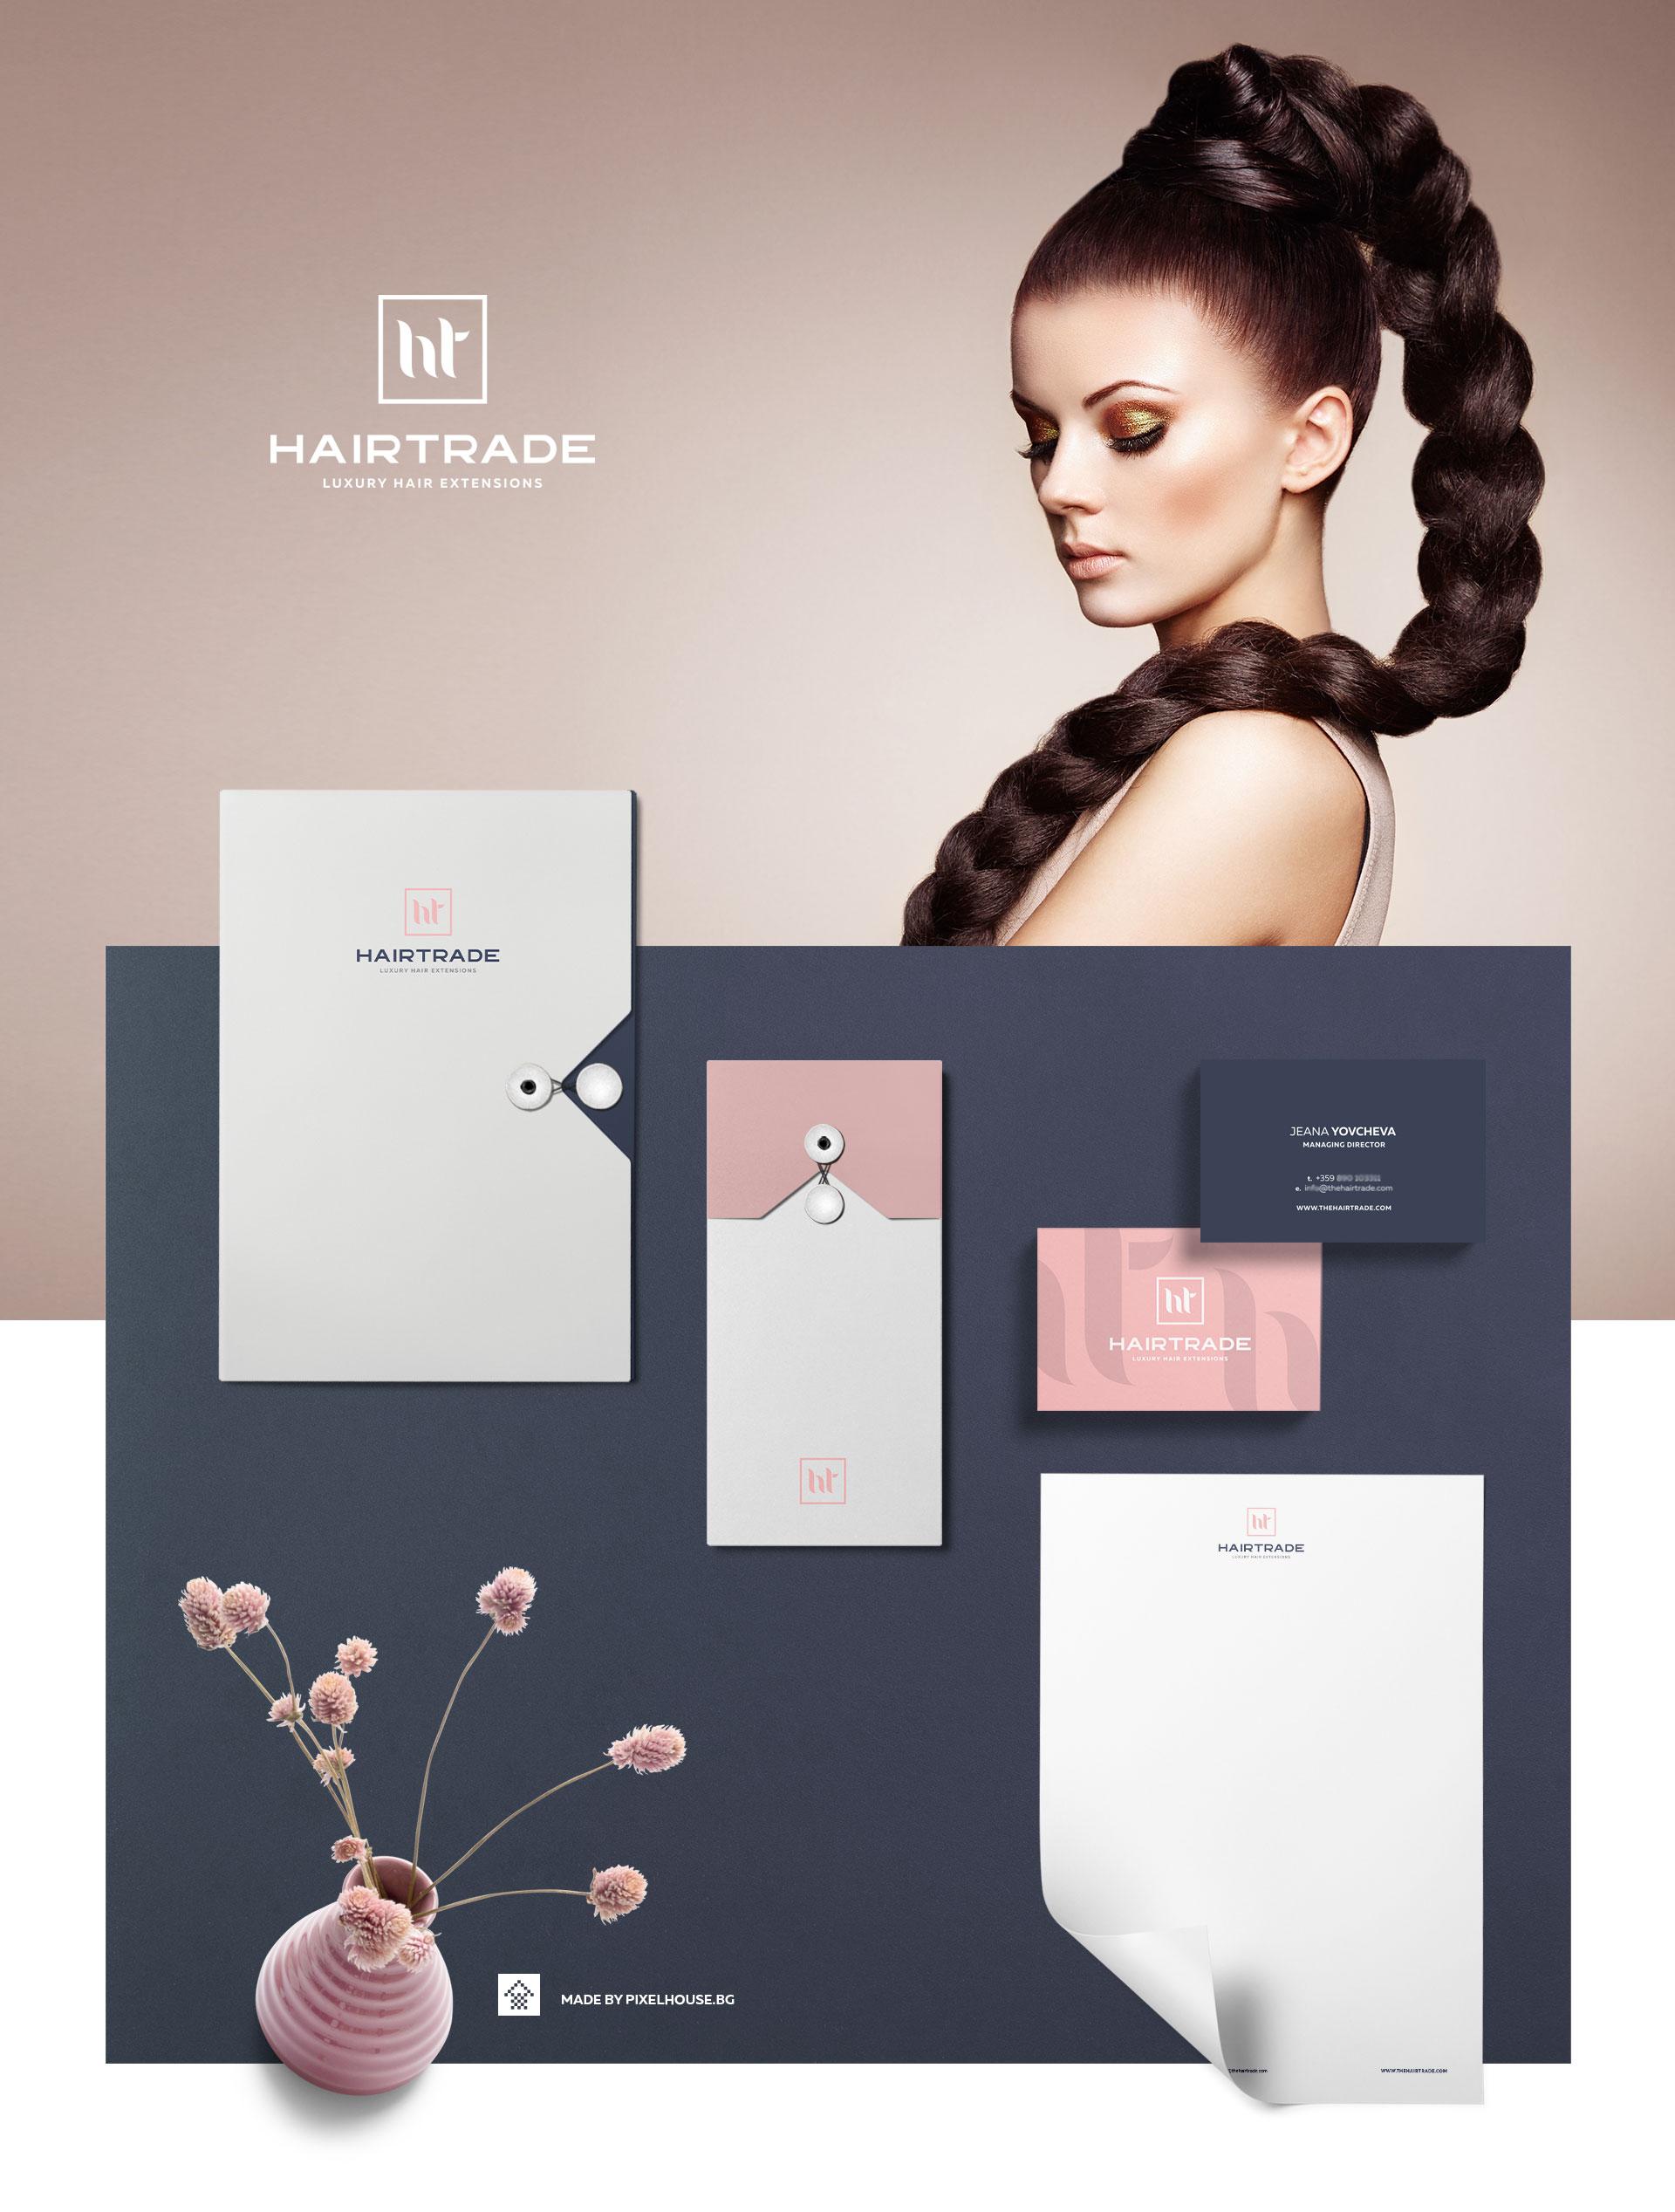 HairTrade-branding-image2>